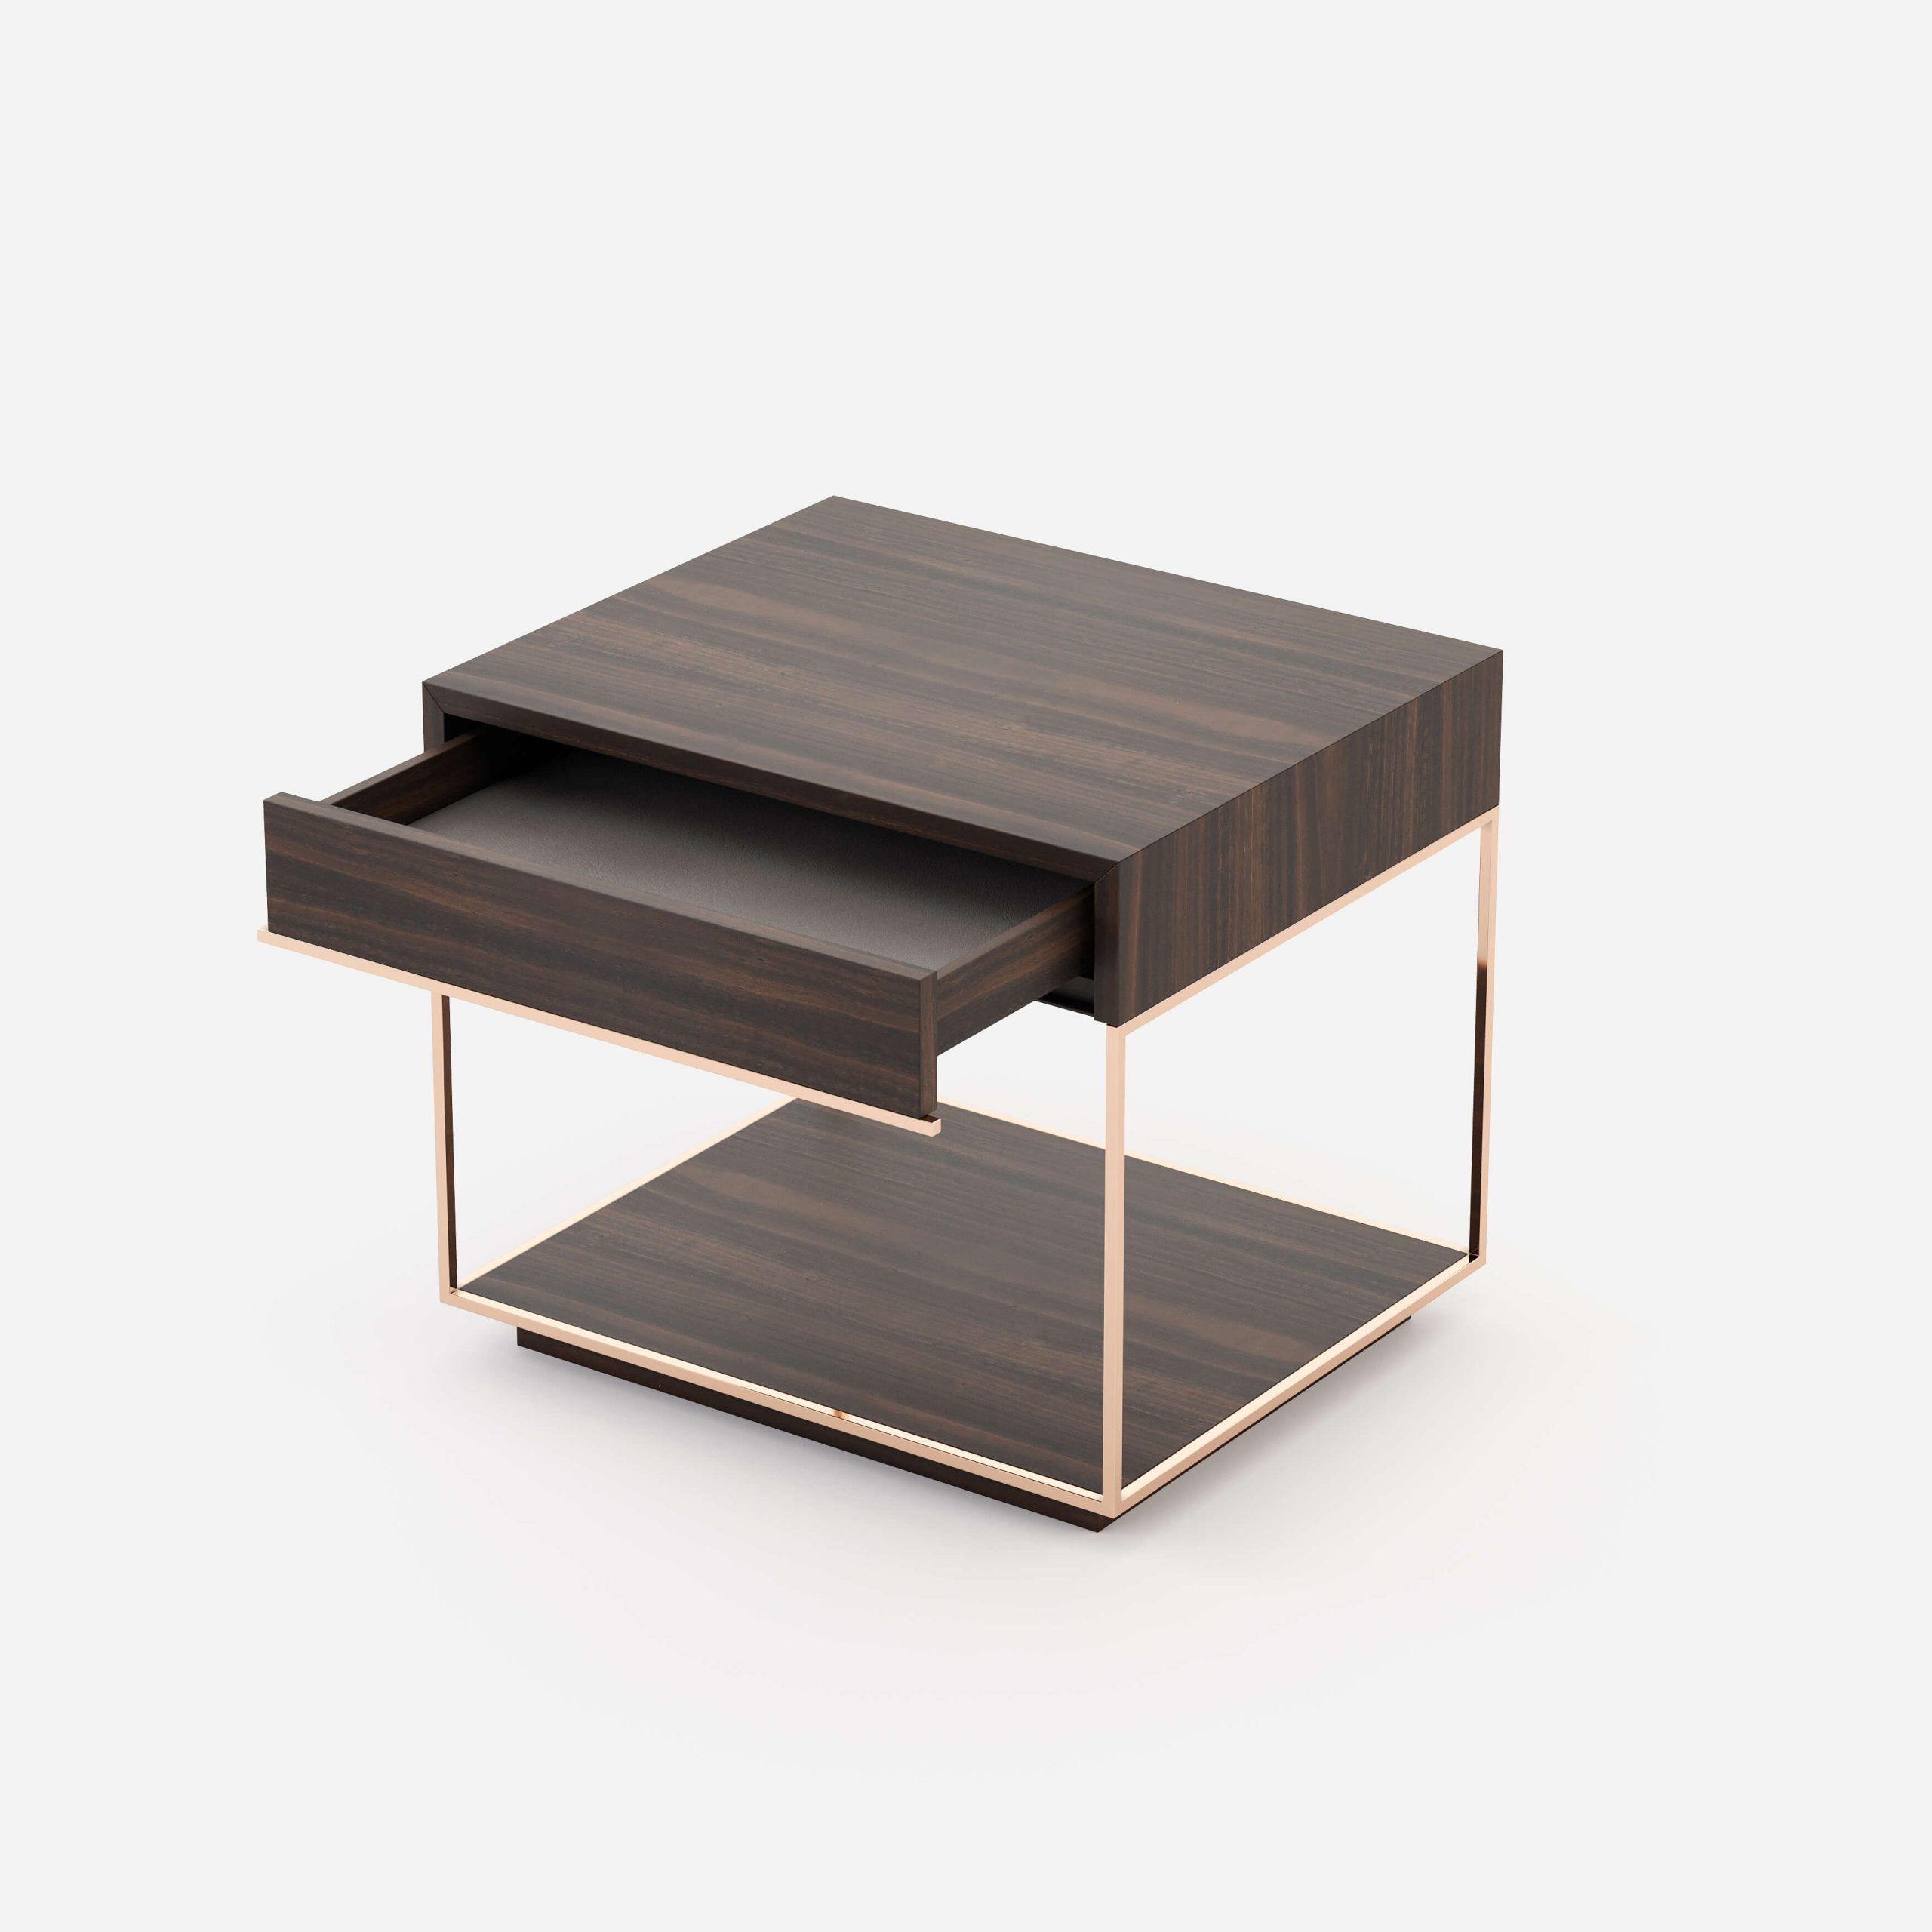 Modernūs miegamojo baldai spintelė Grazi 6